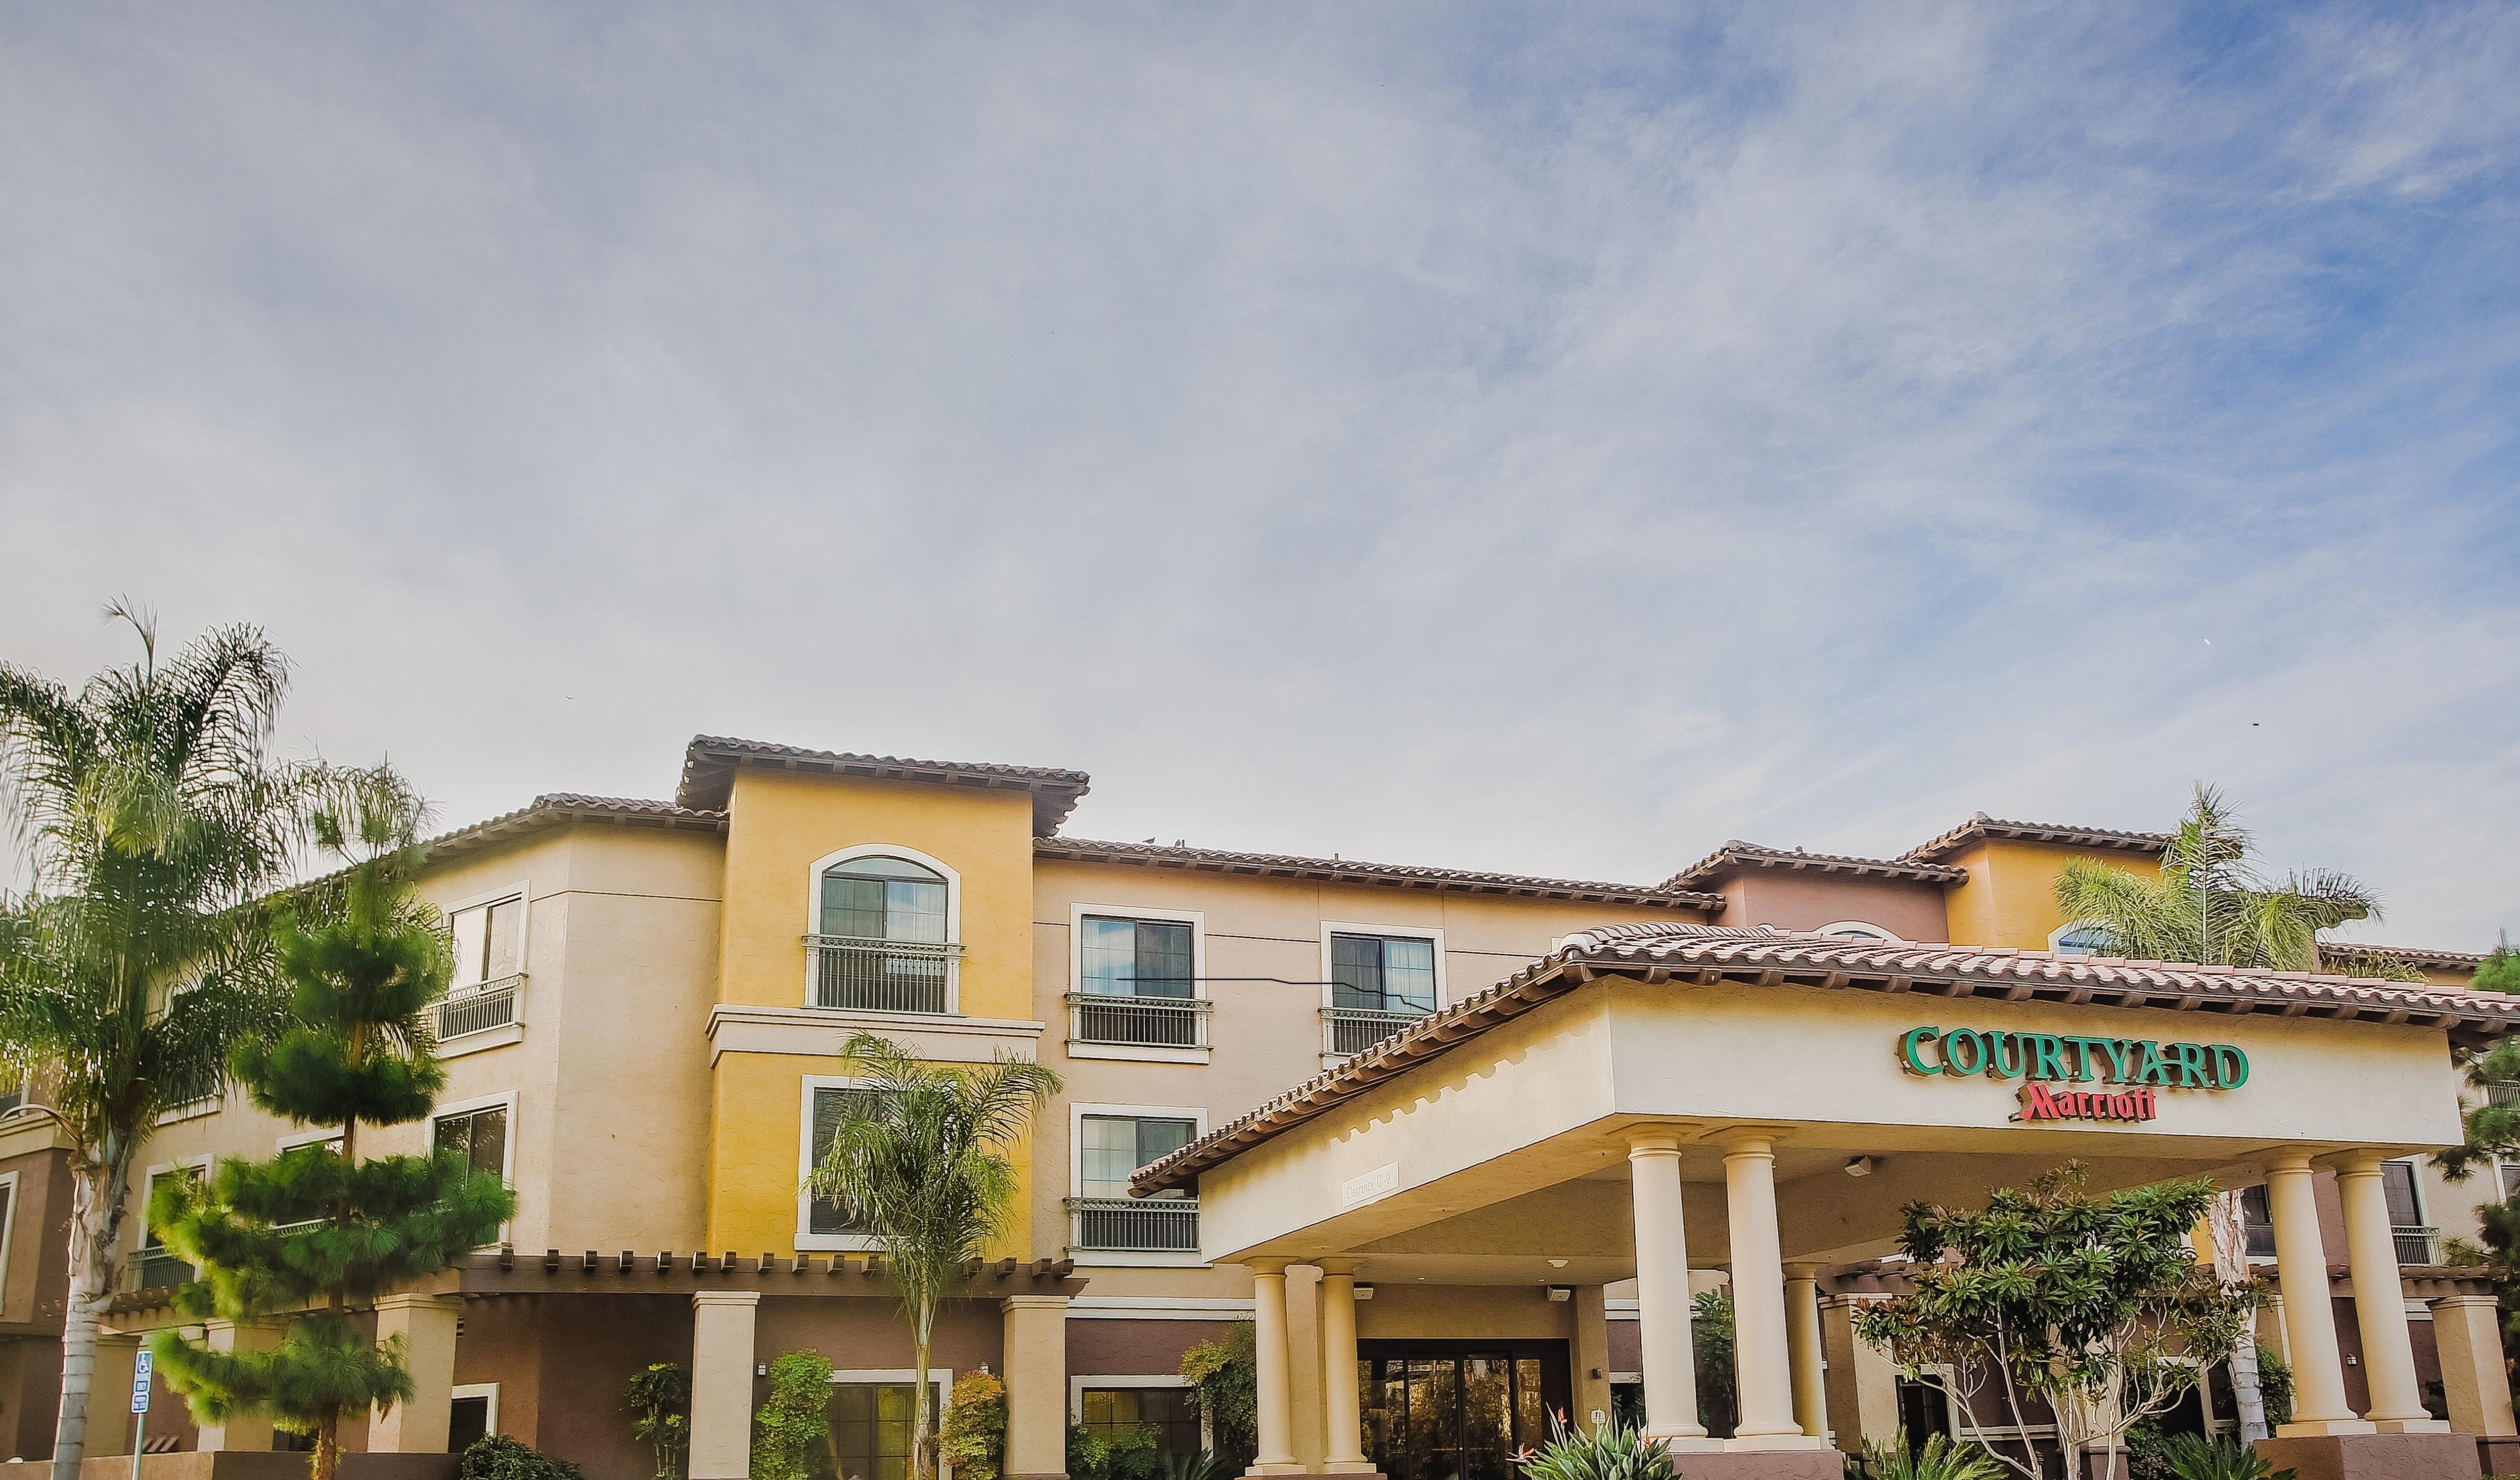 Courtyard by Marriott San Luis Obispo image 0